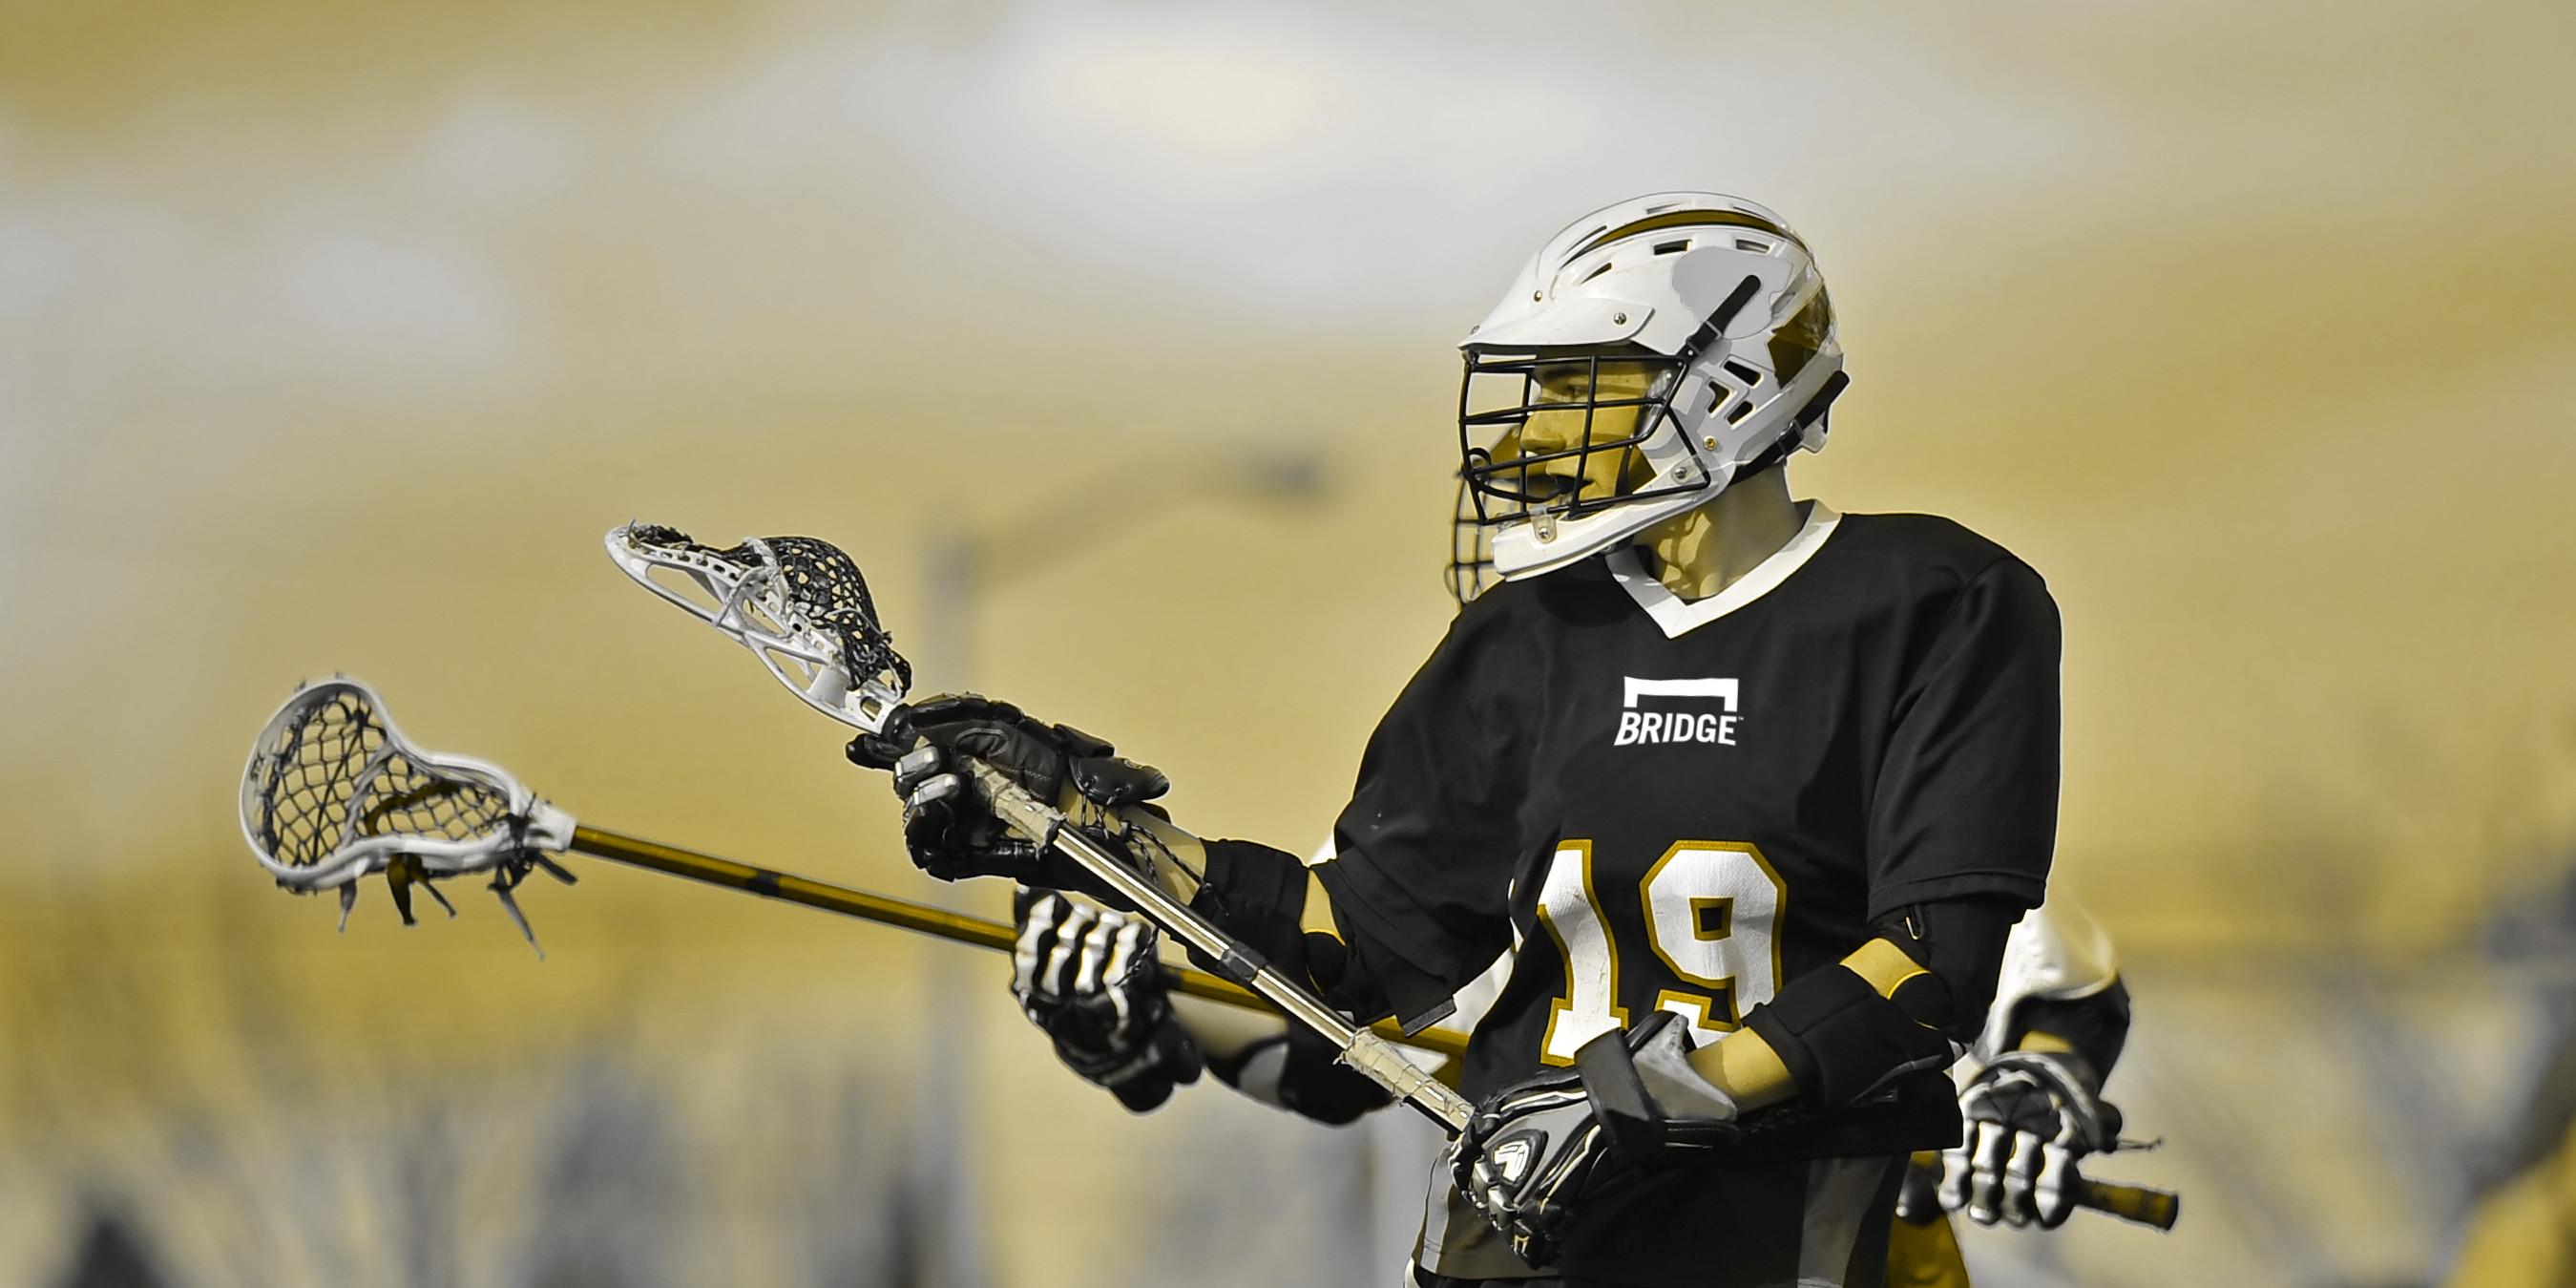 Bridge Lacrosse